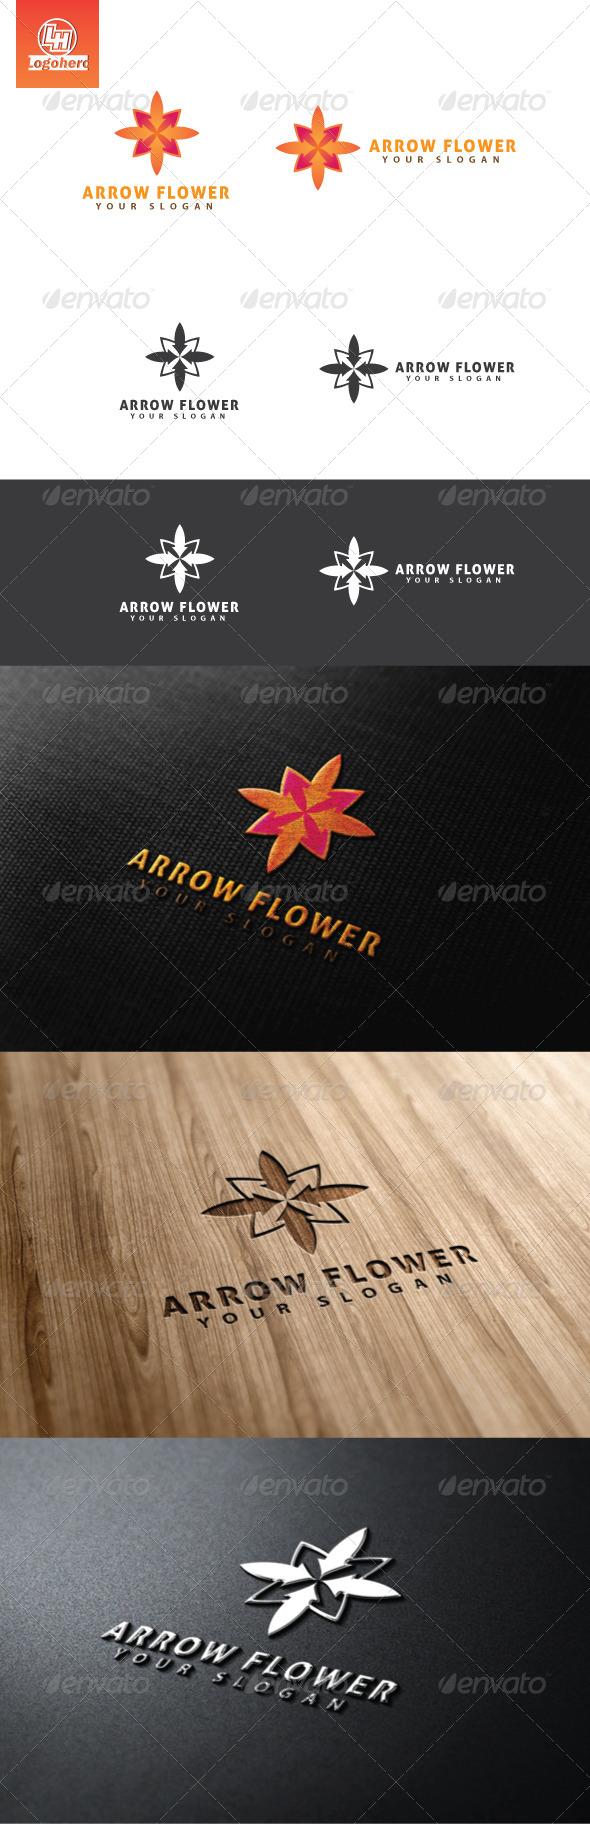 Arrow Flower Logo Template